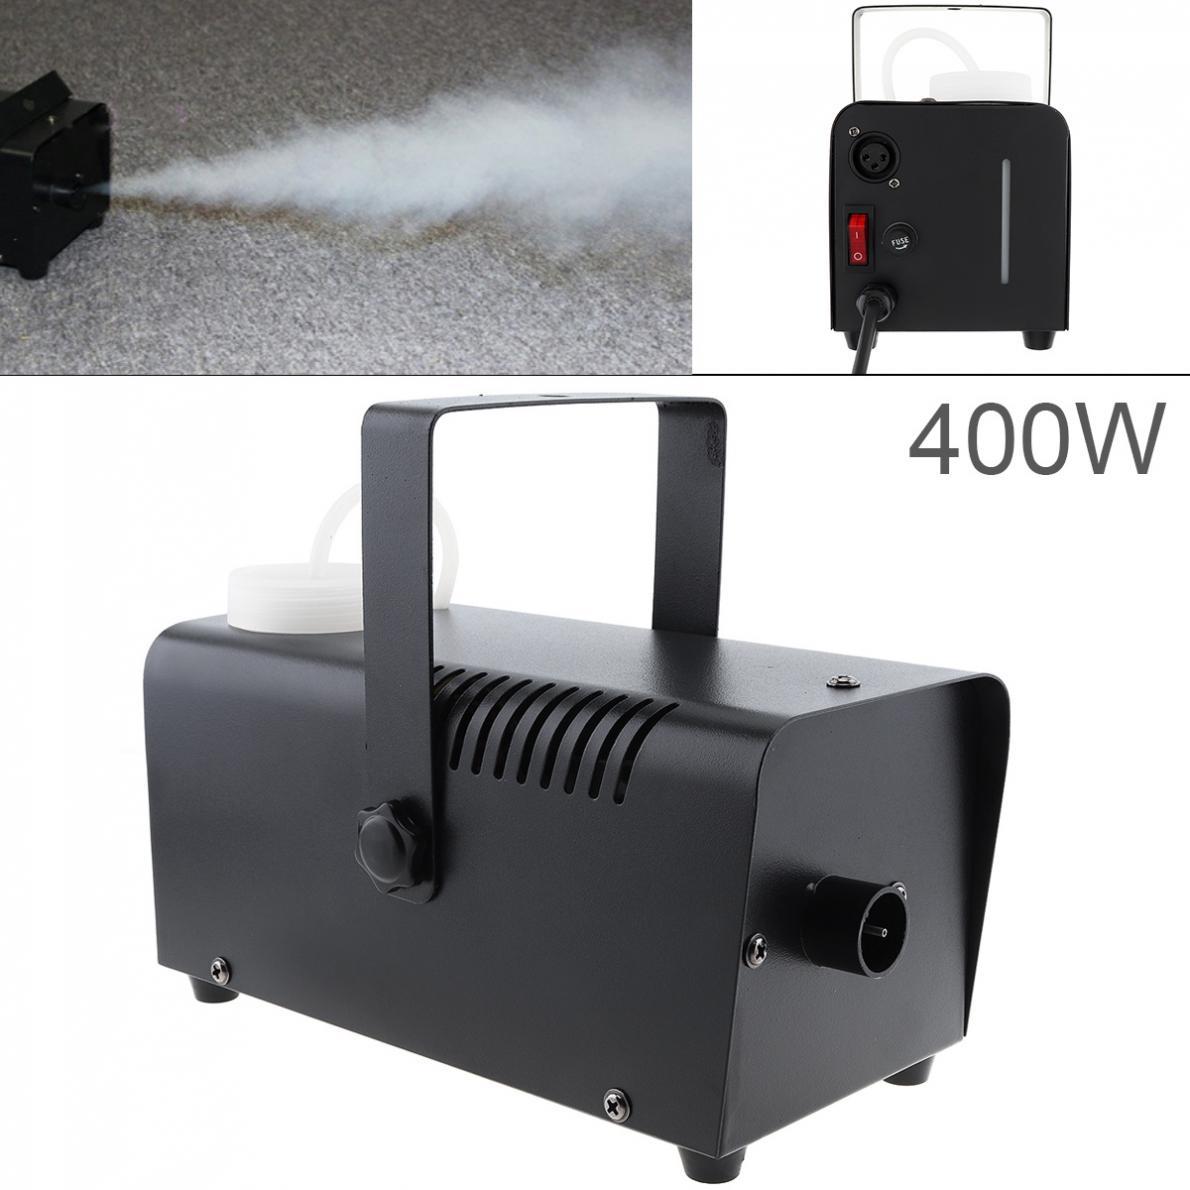 ejetor profissional da nevoa da maquina da nevoa da capa do controle 400 w do fio